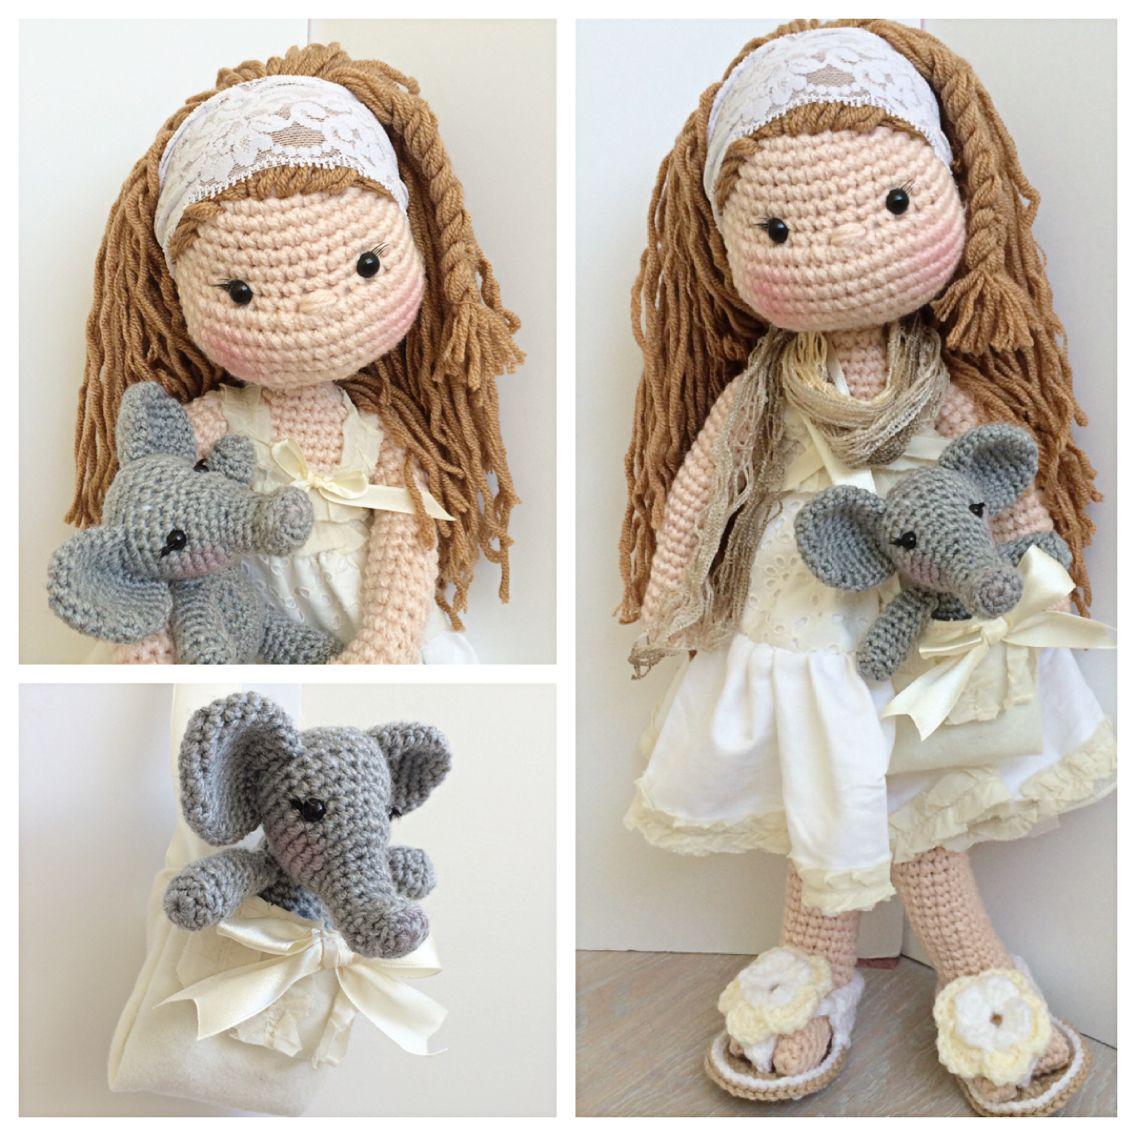 Boho amigurumi doll and crochet elephant | muñecas ganchillo ...